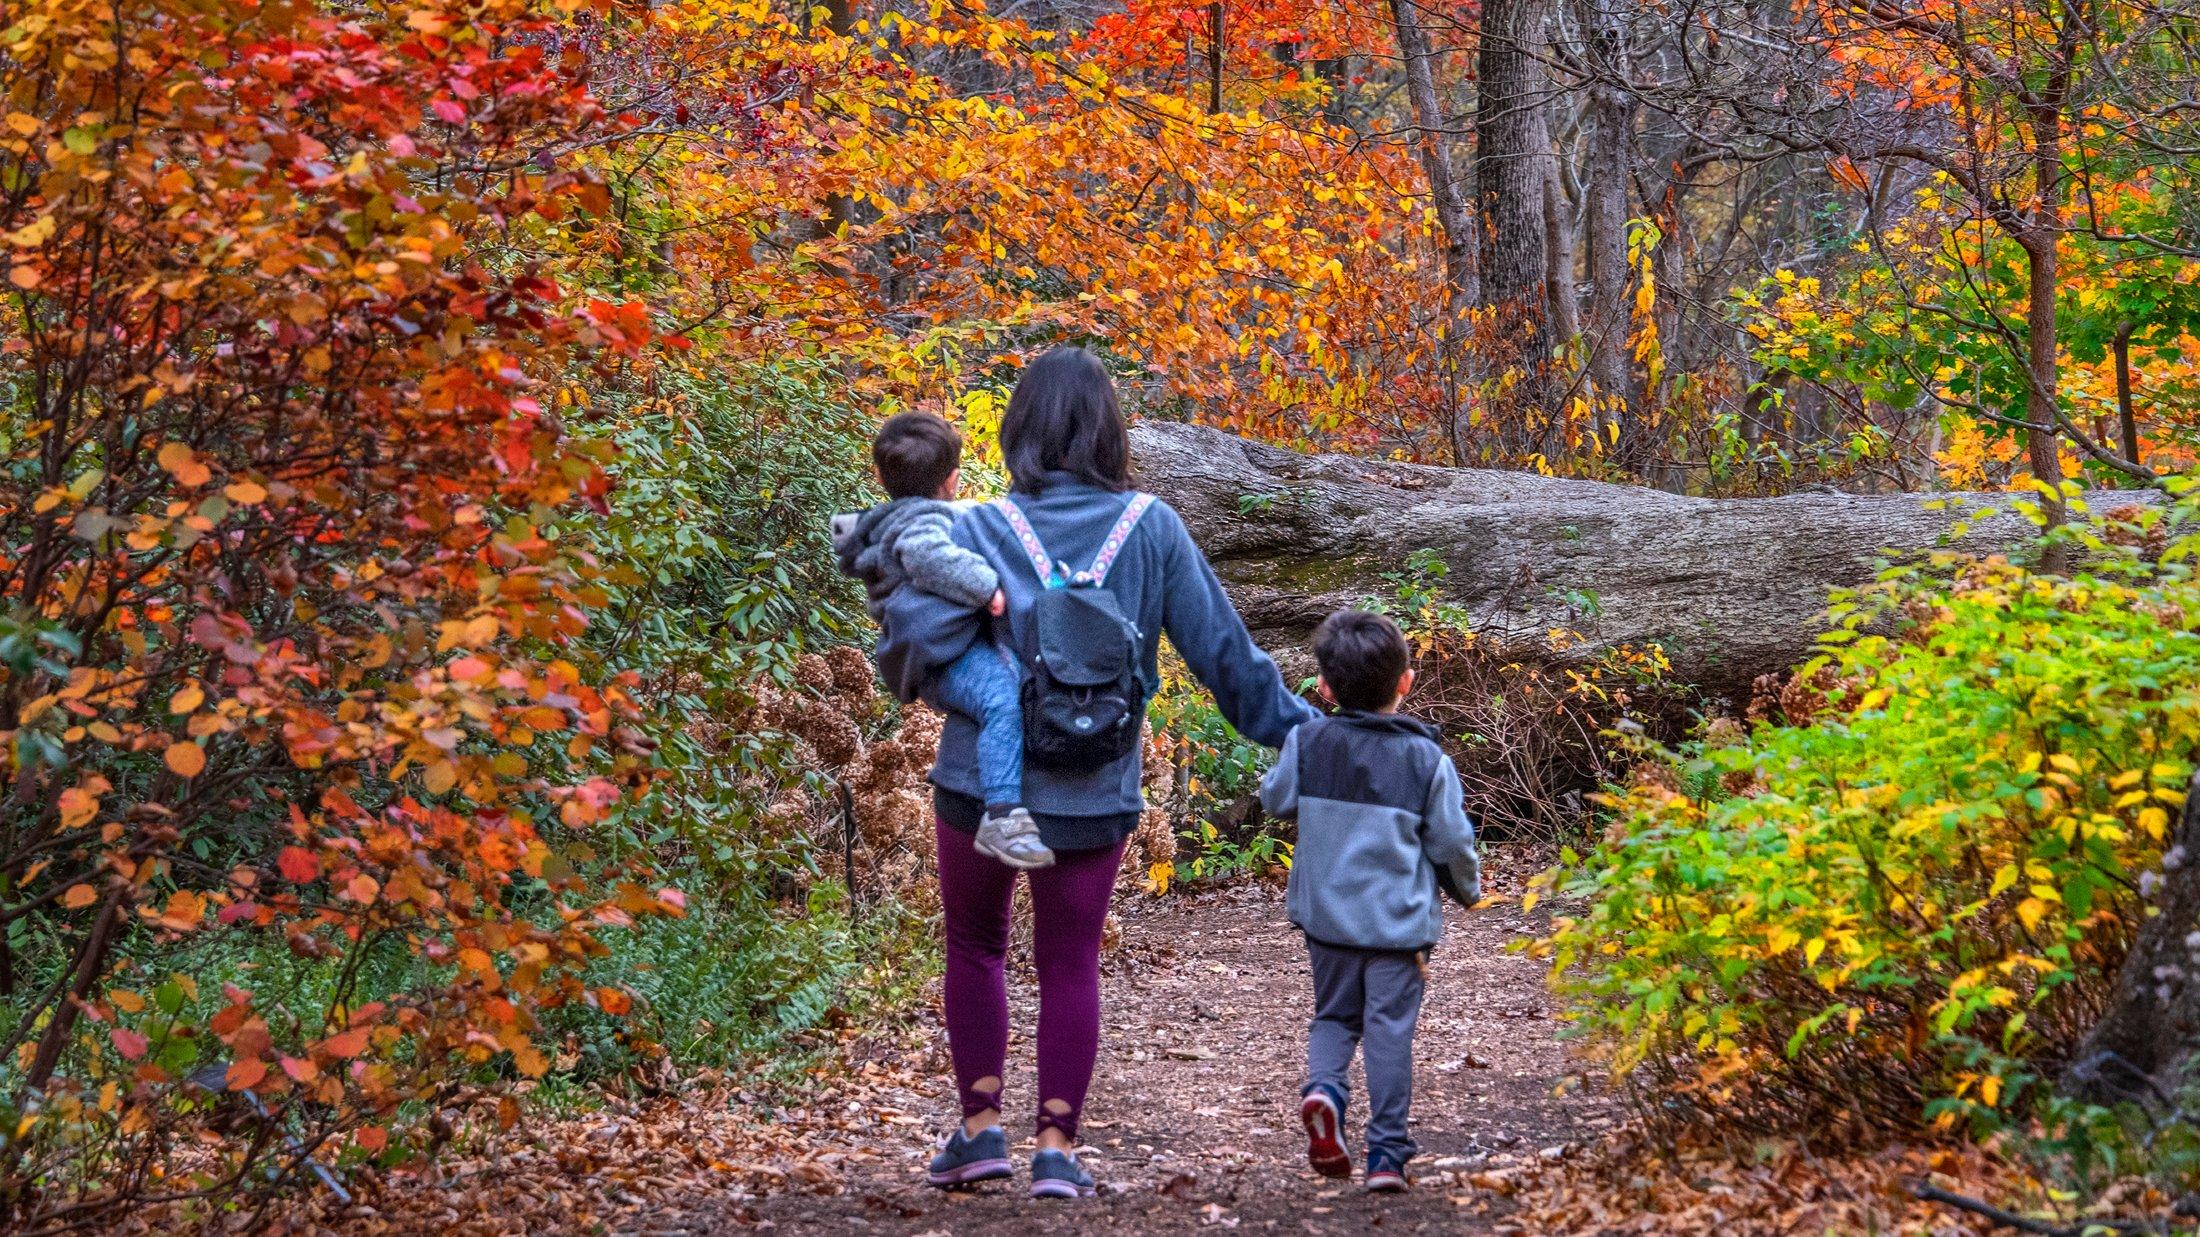 Top Spots To View Fall Foliage In Greater Philadelphia Visit Philadelphia